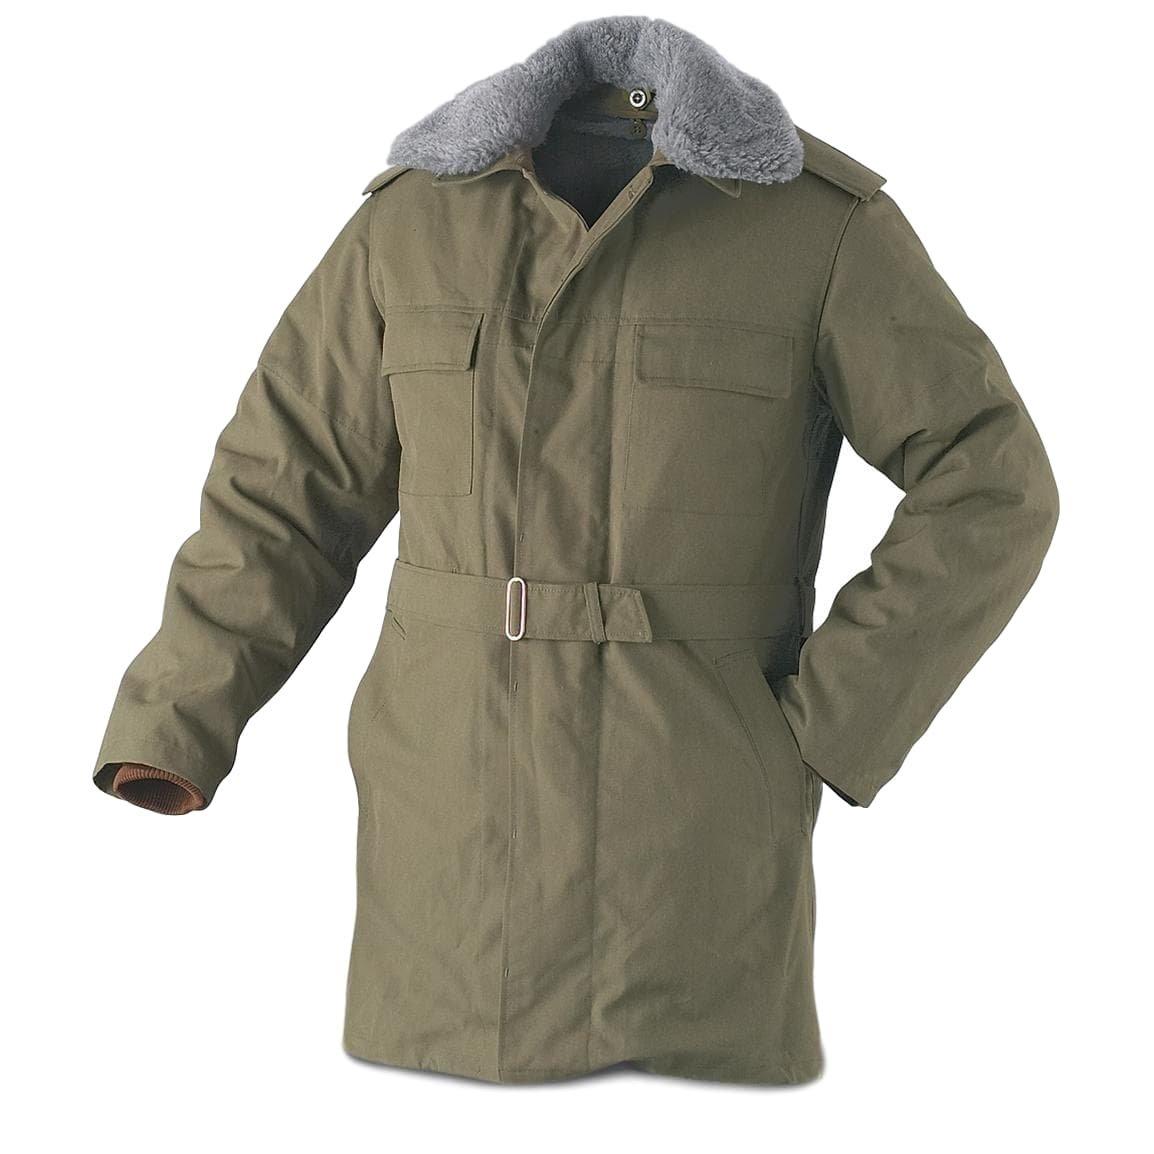 9f01758ff07c1 CZECH ARMY WINTER PARKA: Amazon.co.uk: Clothing